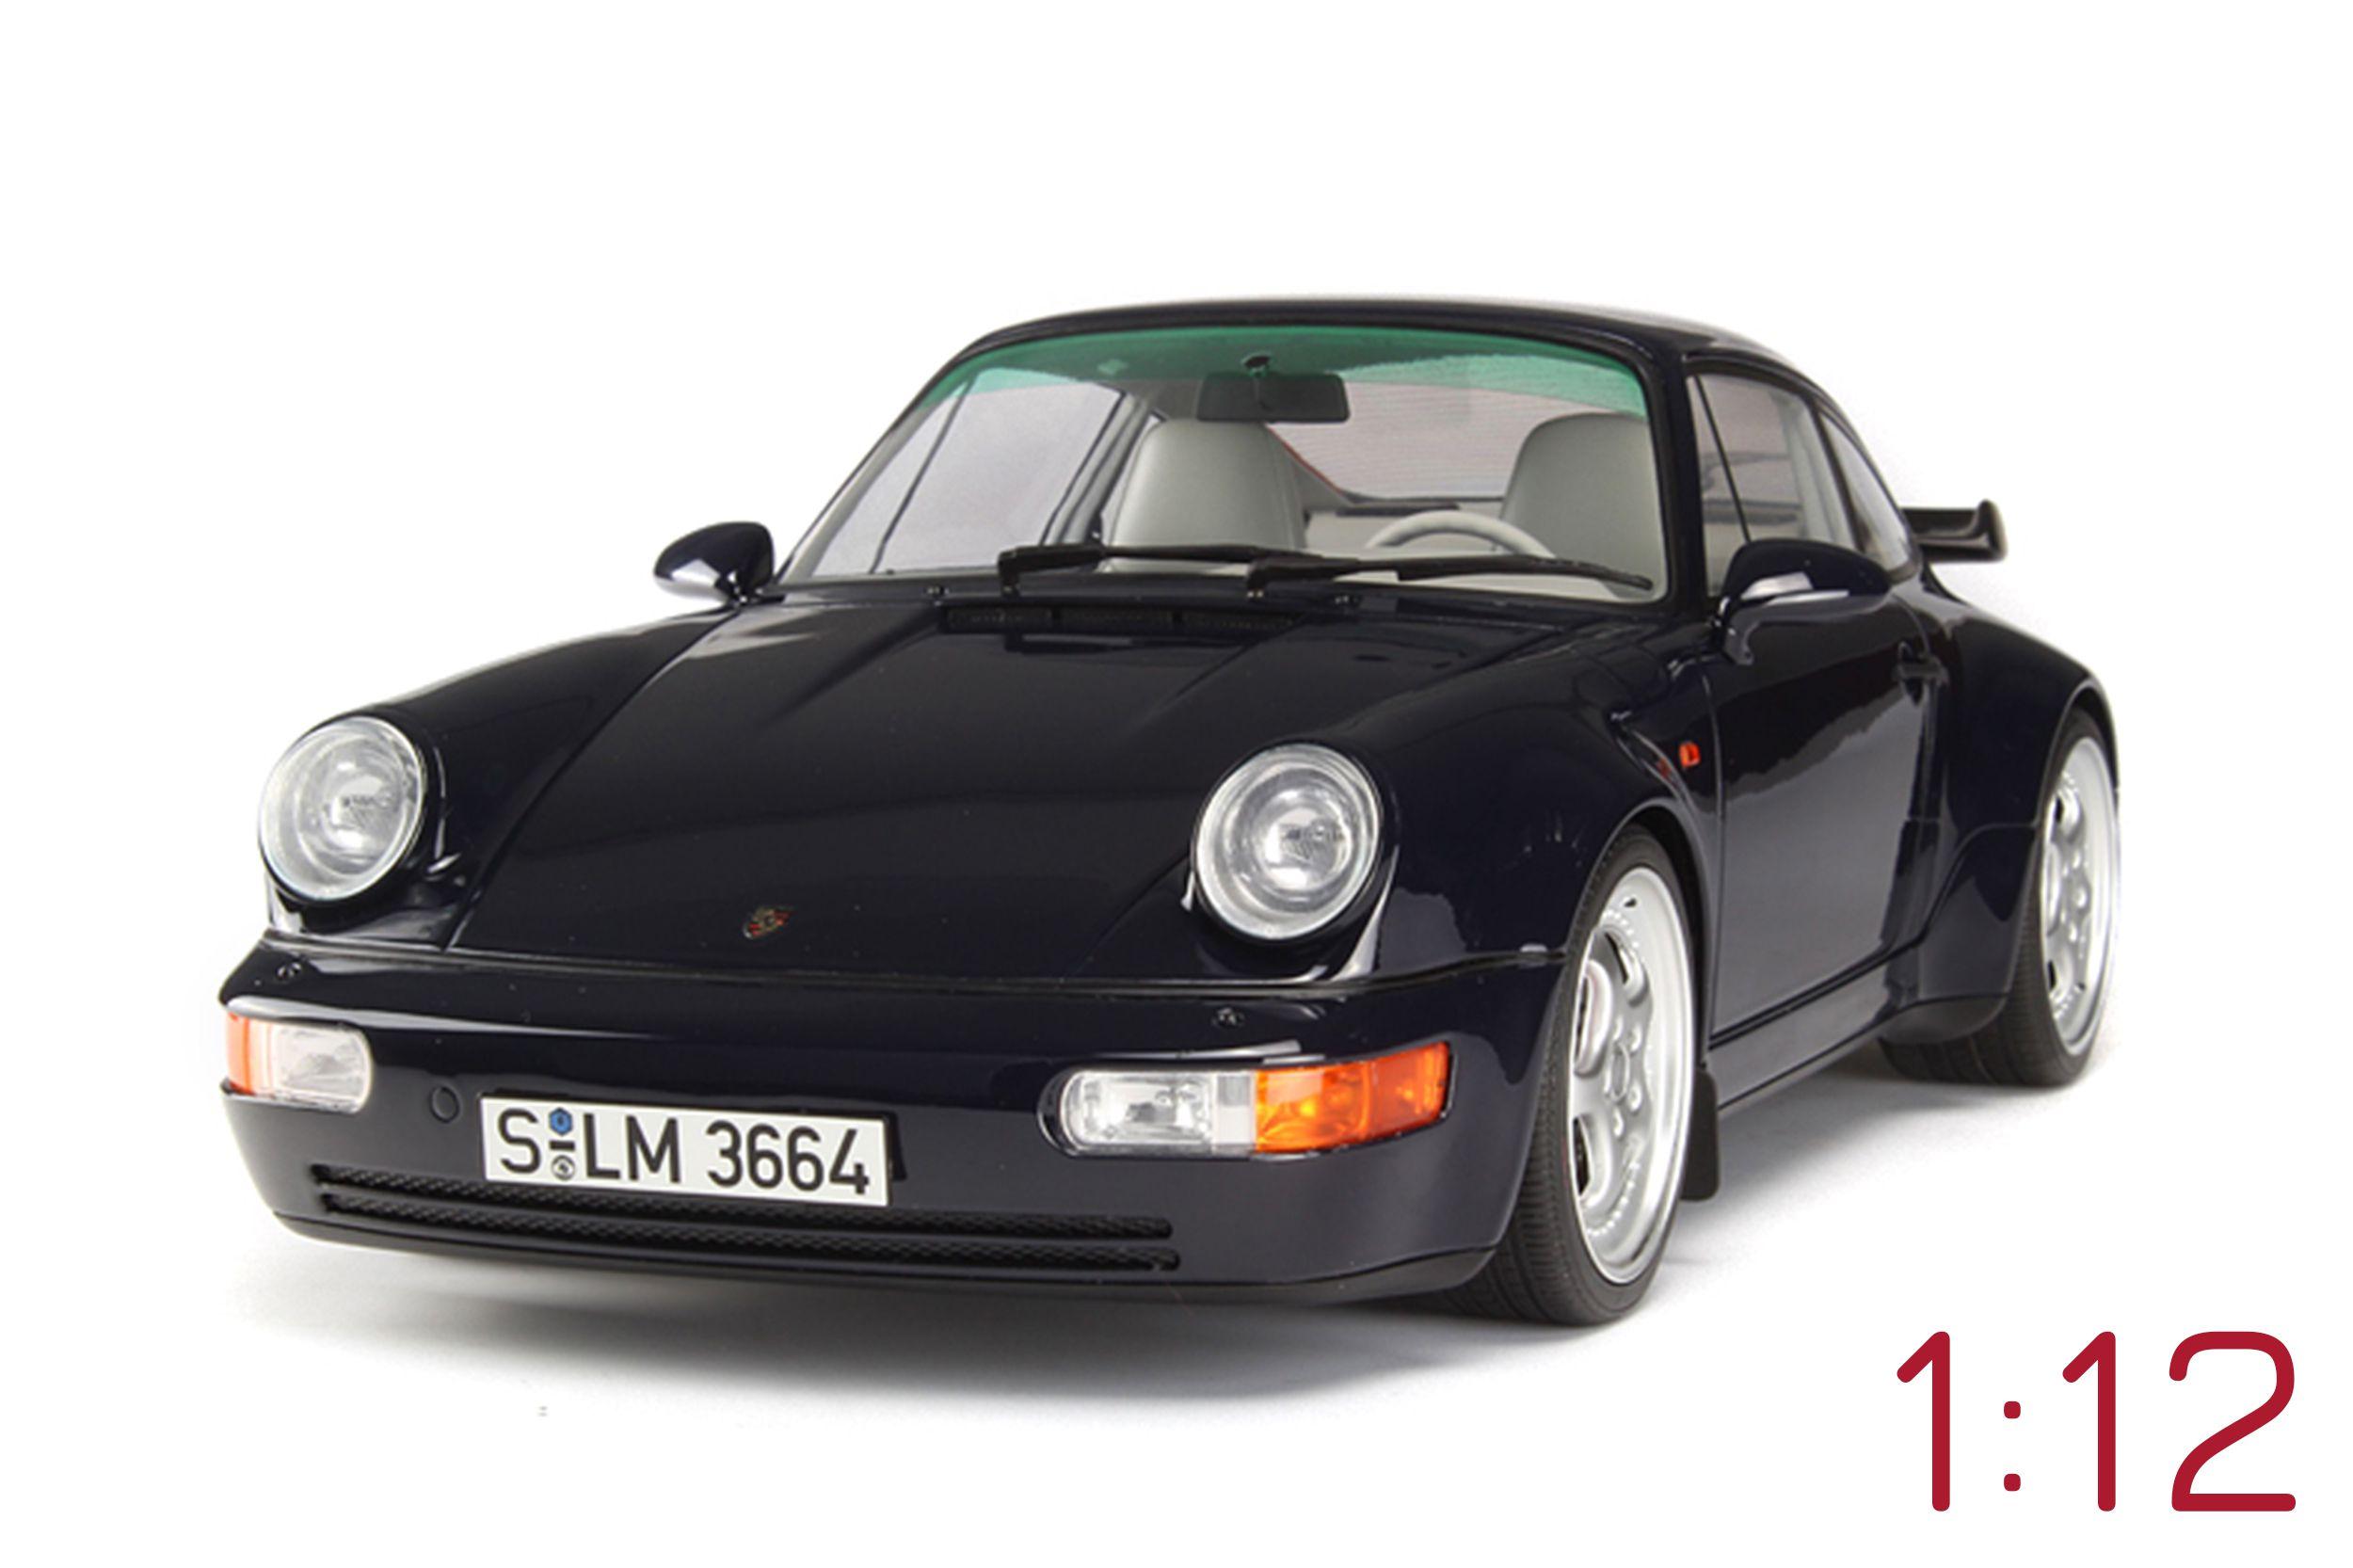 porsche 911 964 turbo 3 6 voiture miniature de collection gt spirit. Black Bedroom Furniture Sets. Home Design Ideas